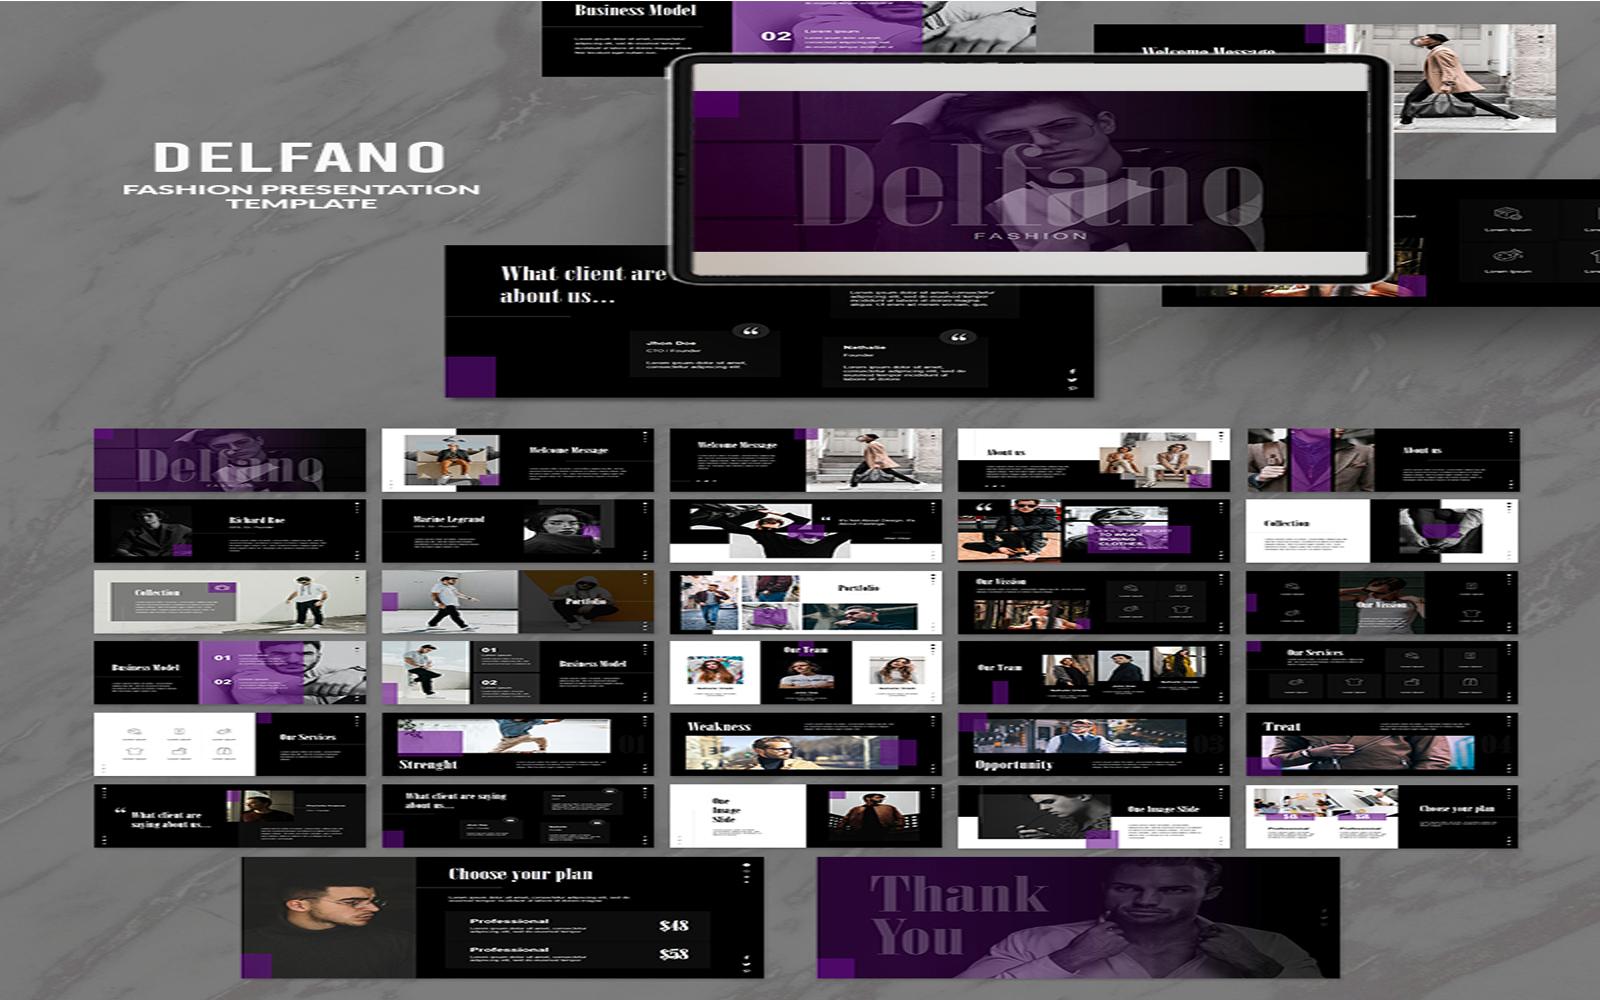 Delfano Presesentation PowerPoint Template